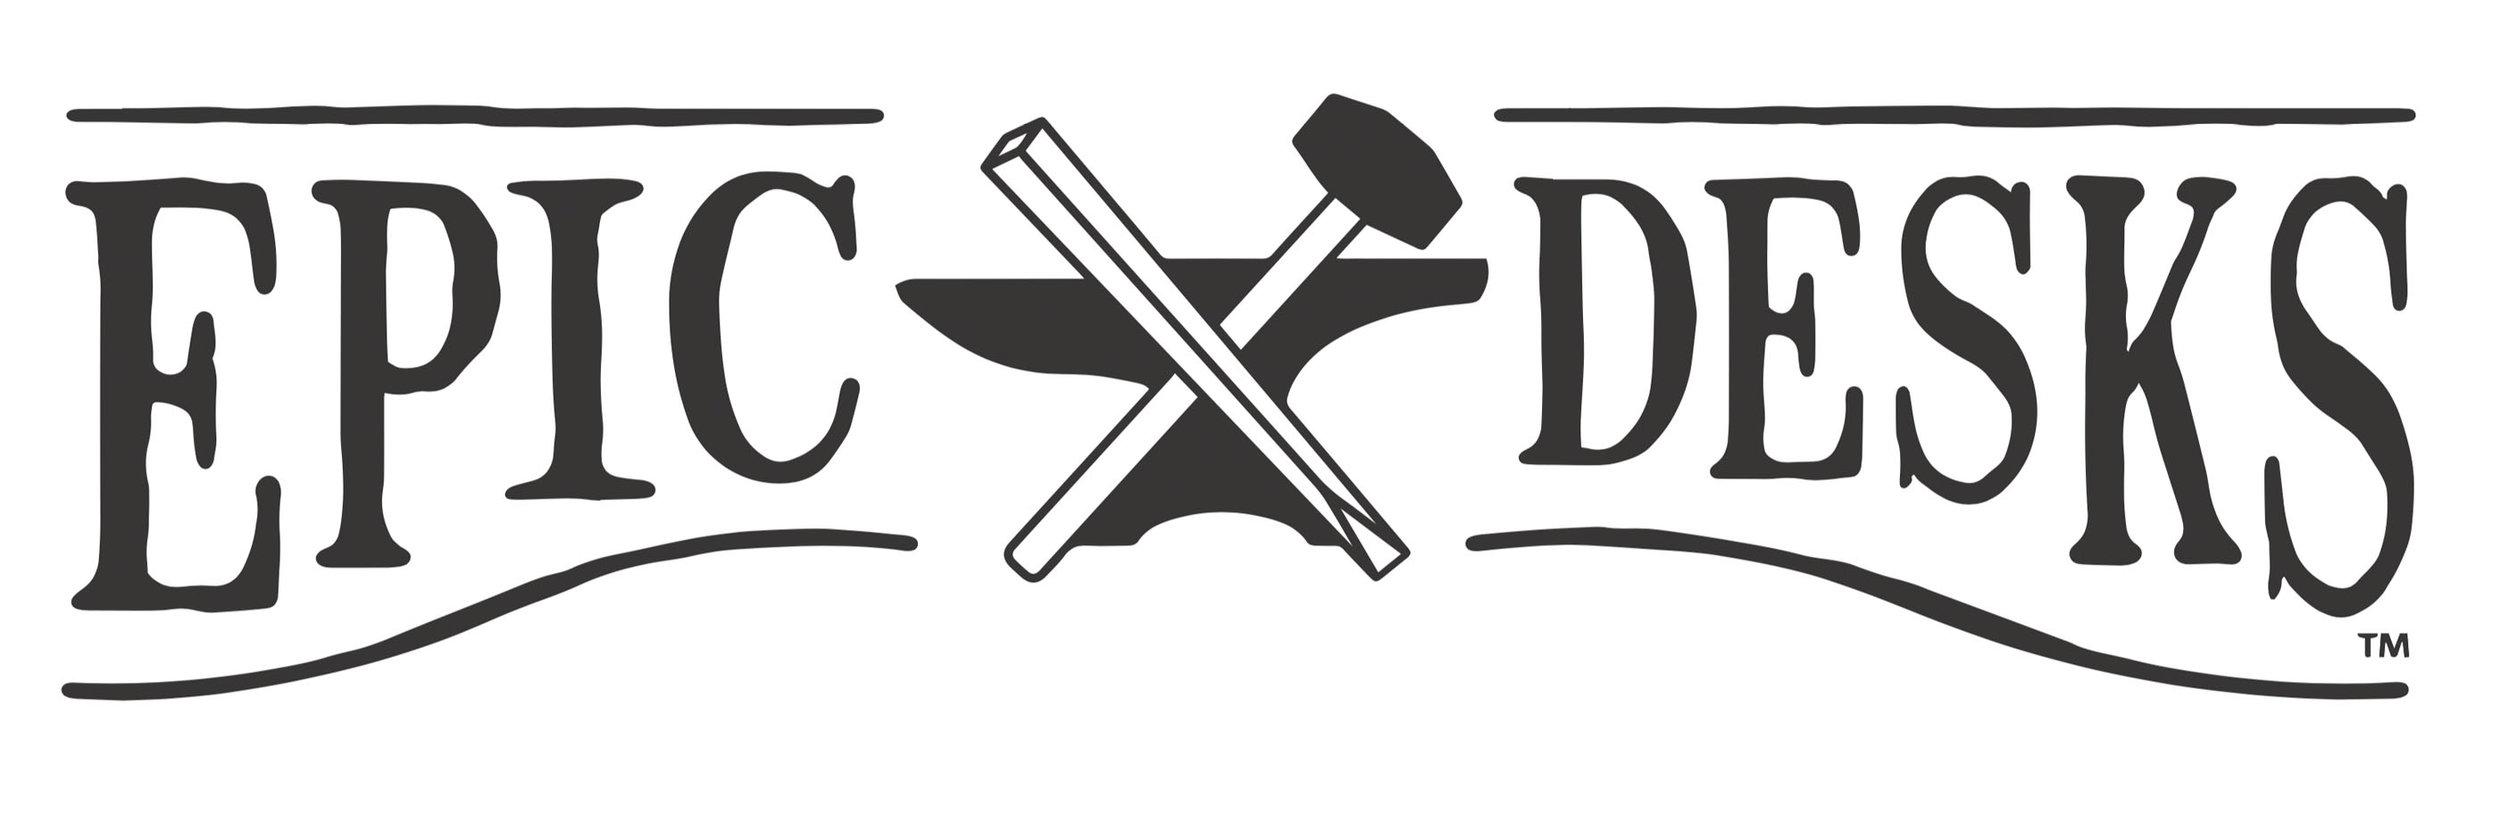 Sheenapendleydp.com-logo-3.jpg